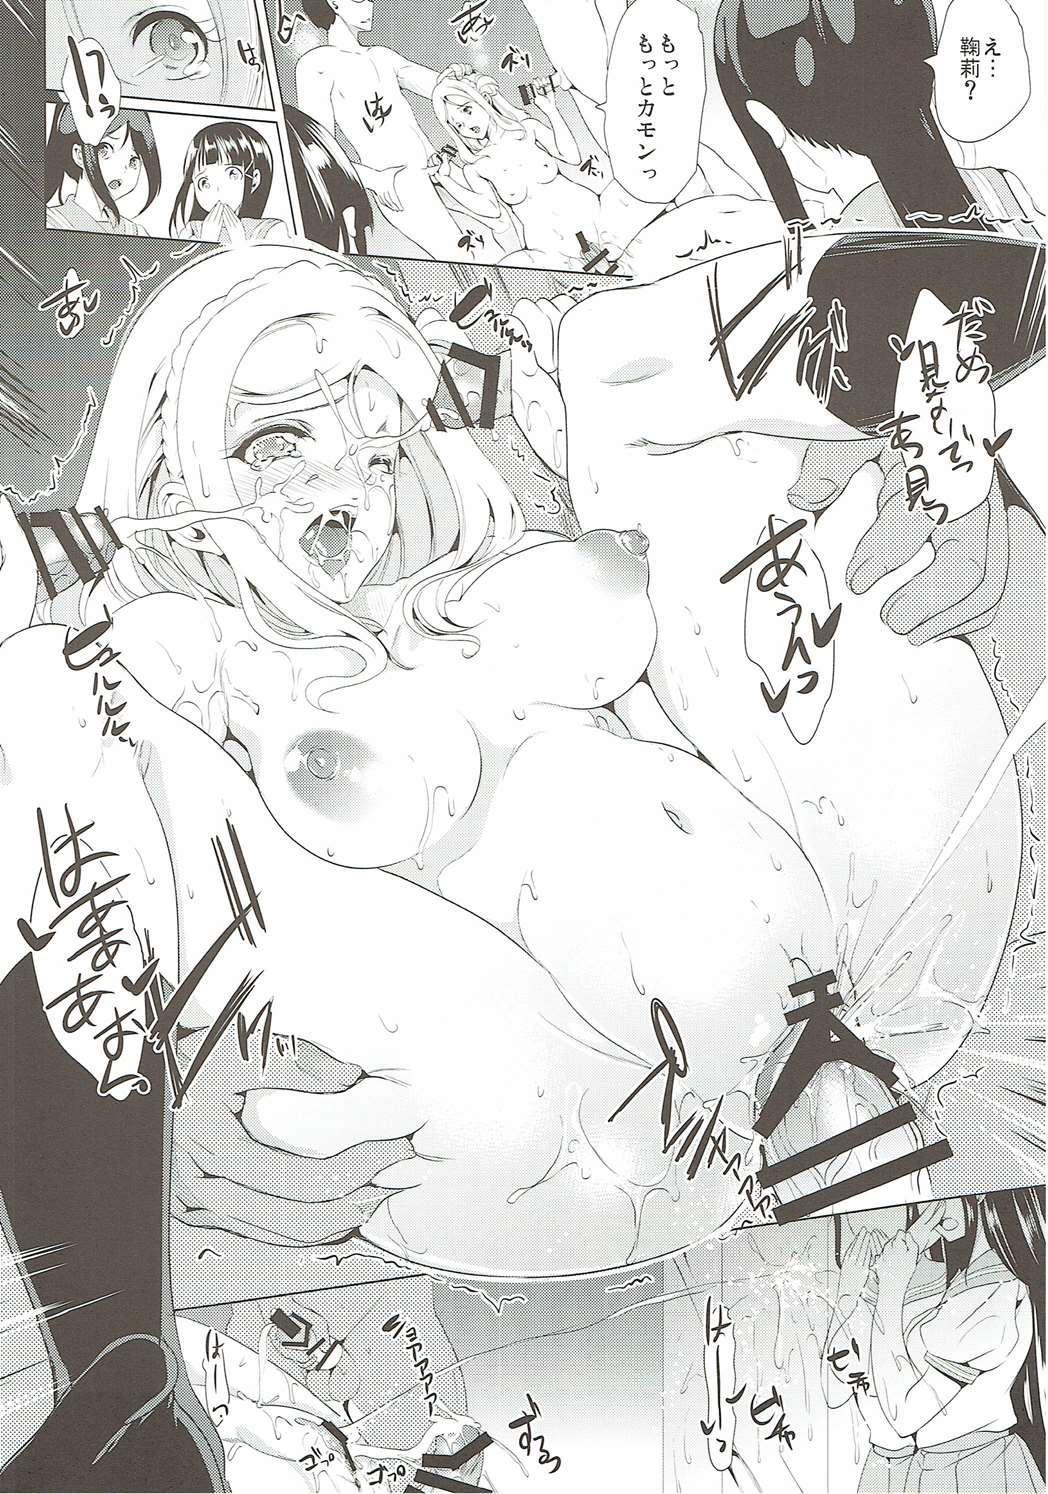 Suisou no Mermaid 14